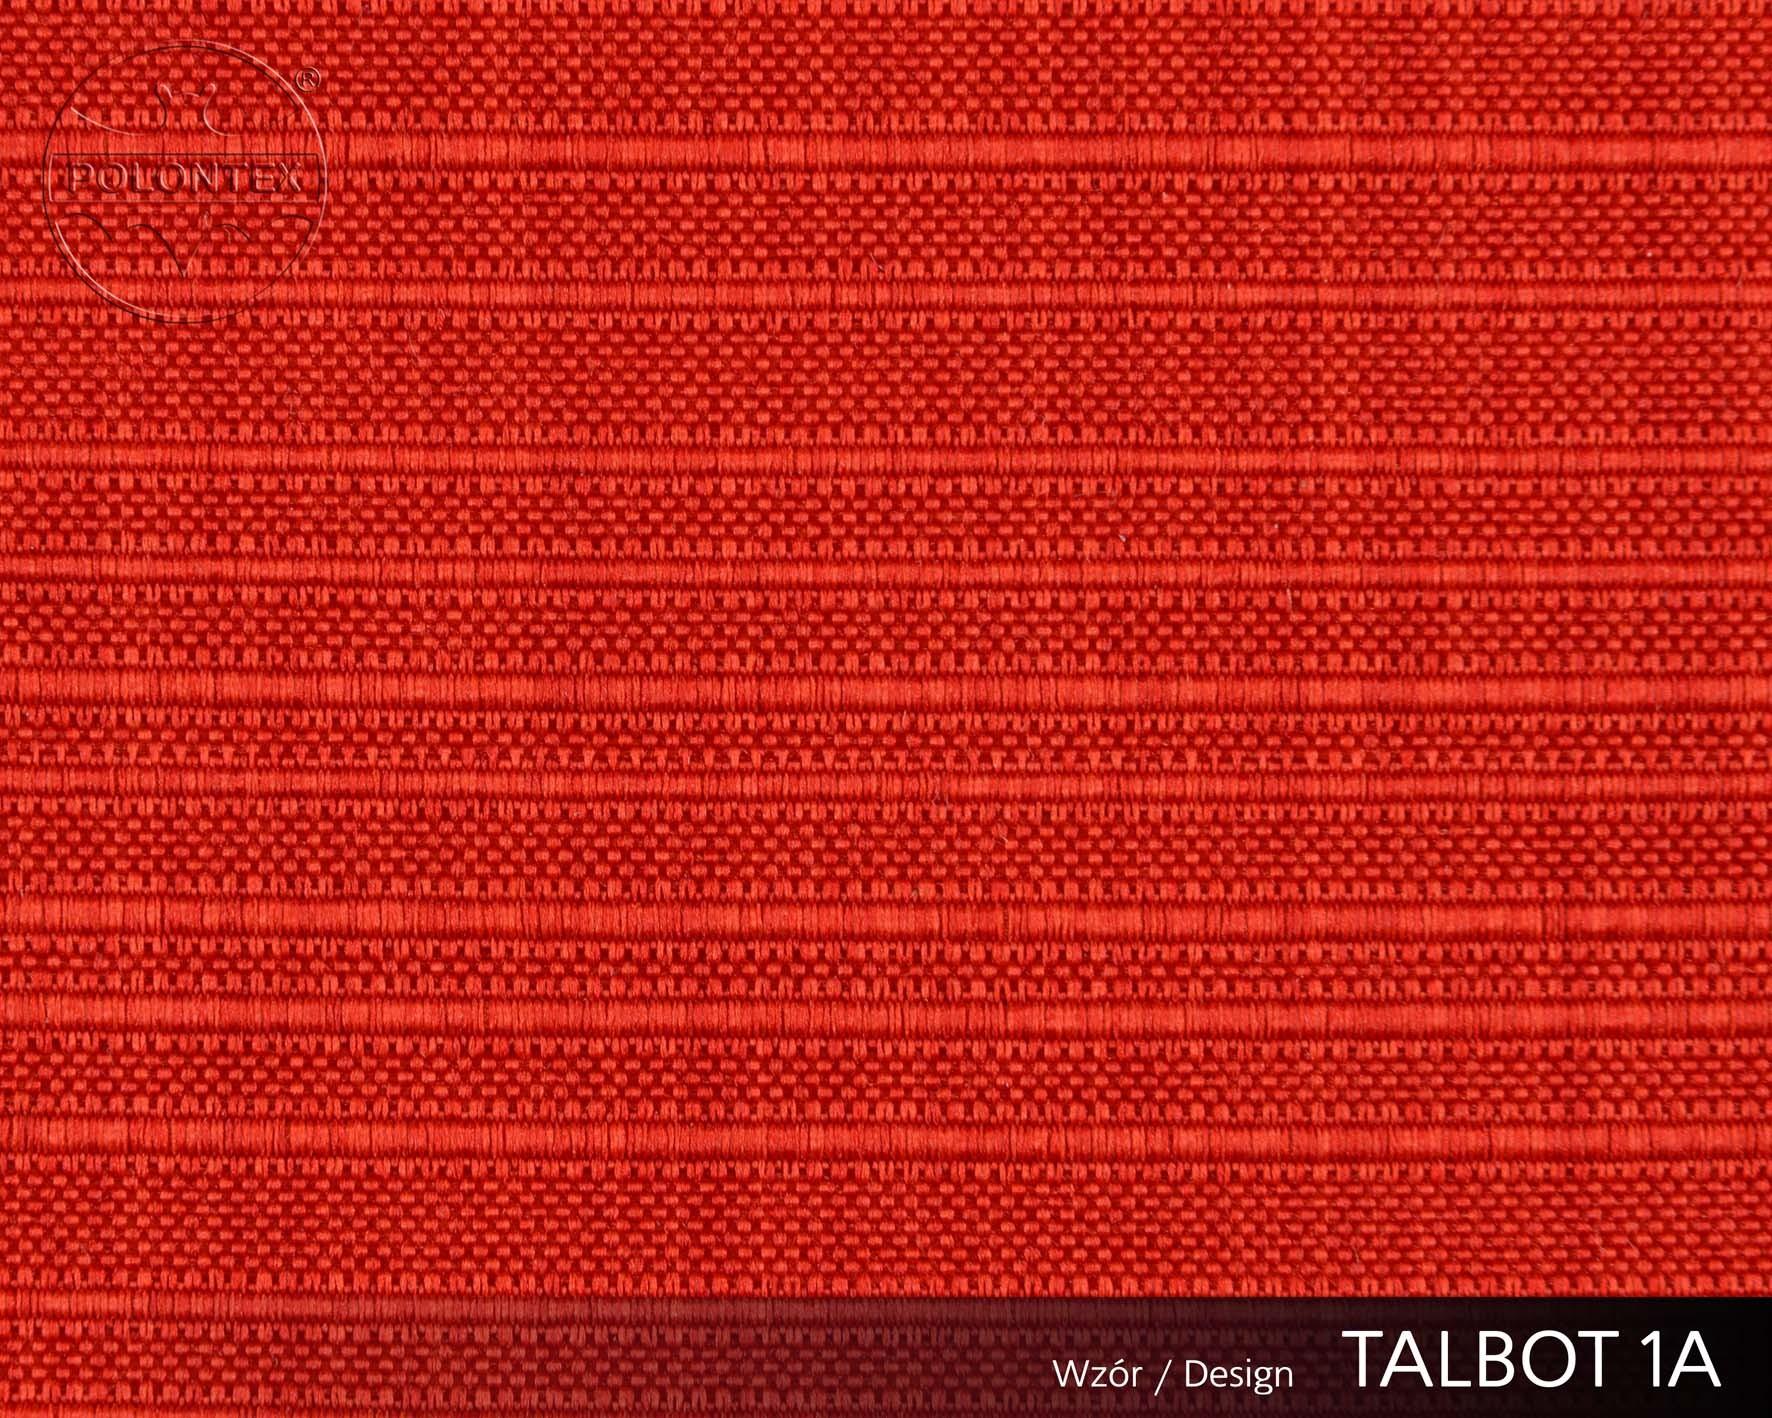 Talbot 1A 3399